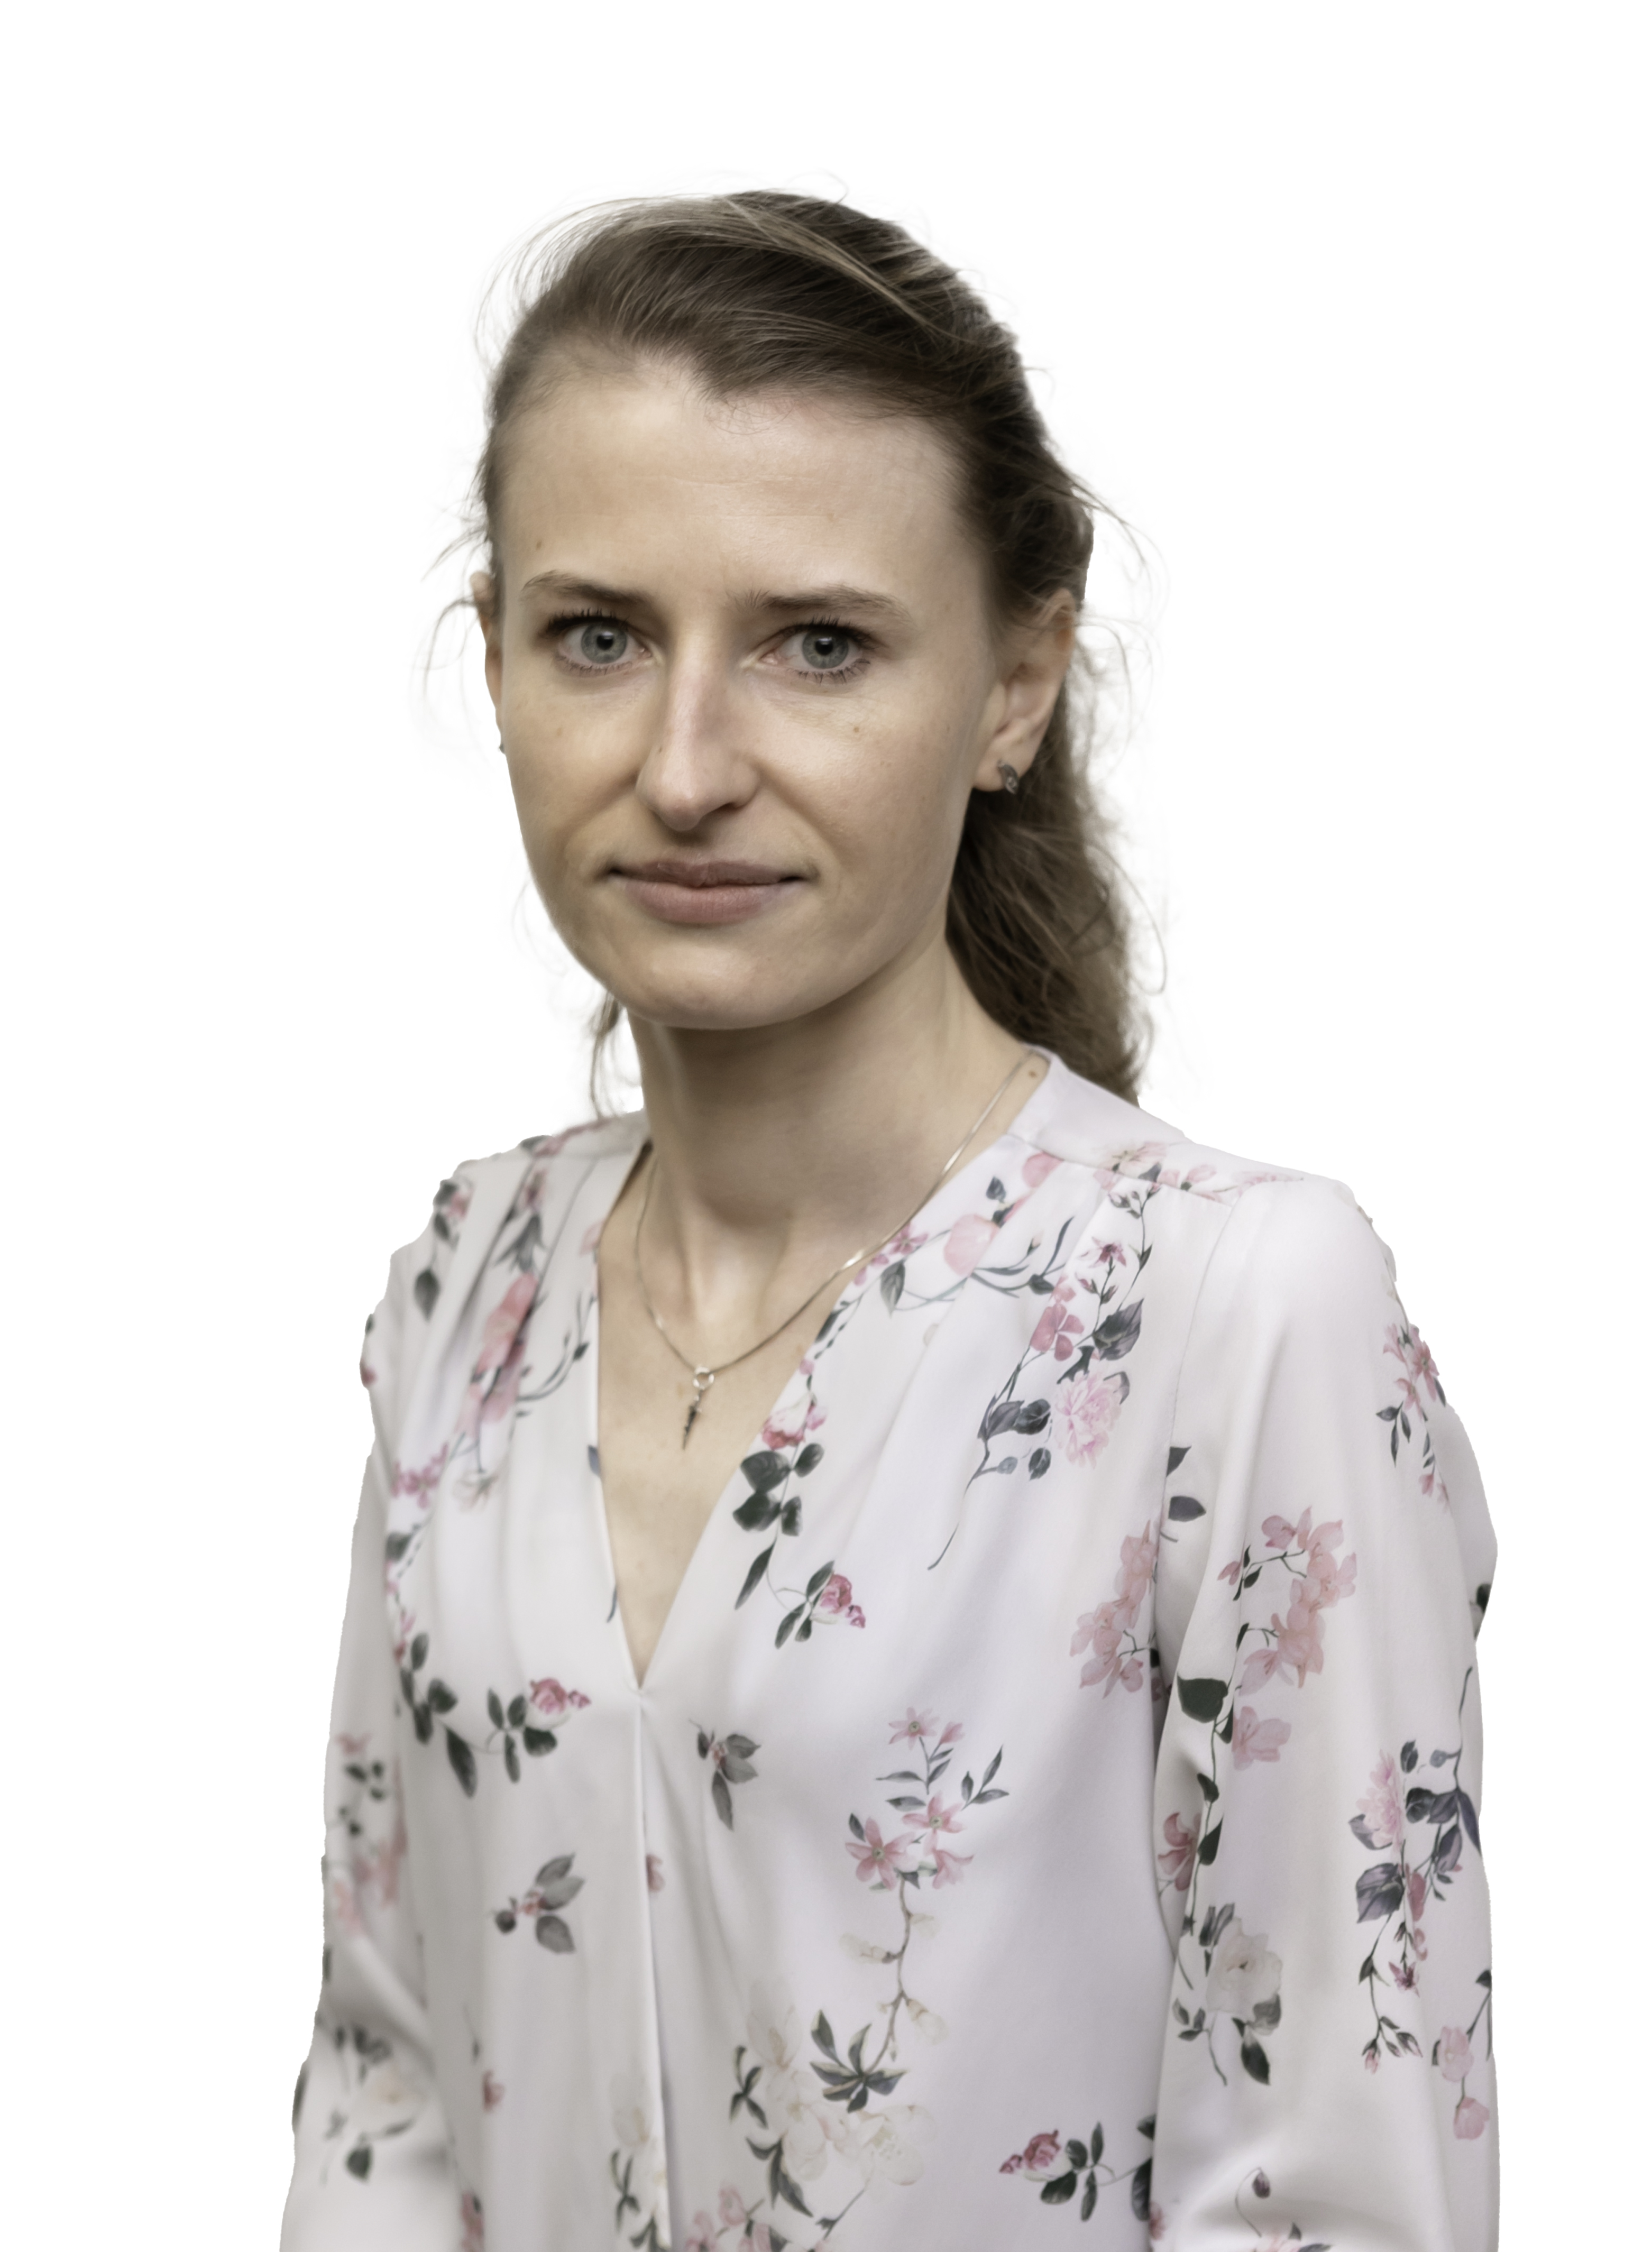 Patricia Kuciel